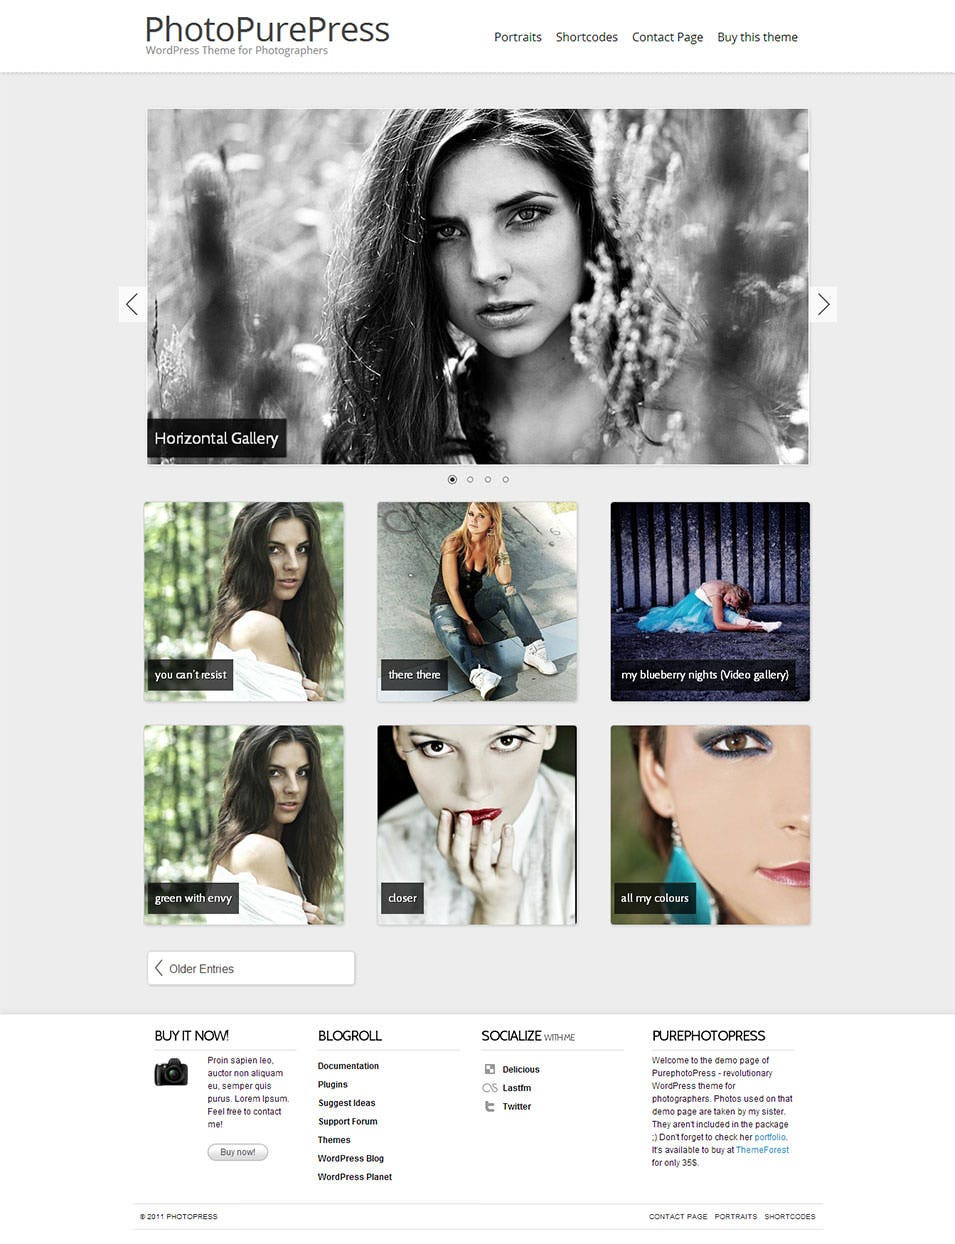 photopurepress wordpress theme for photographers